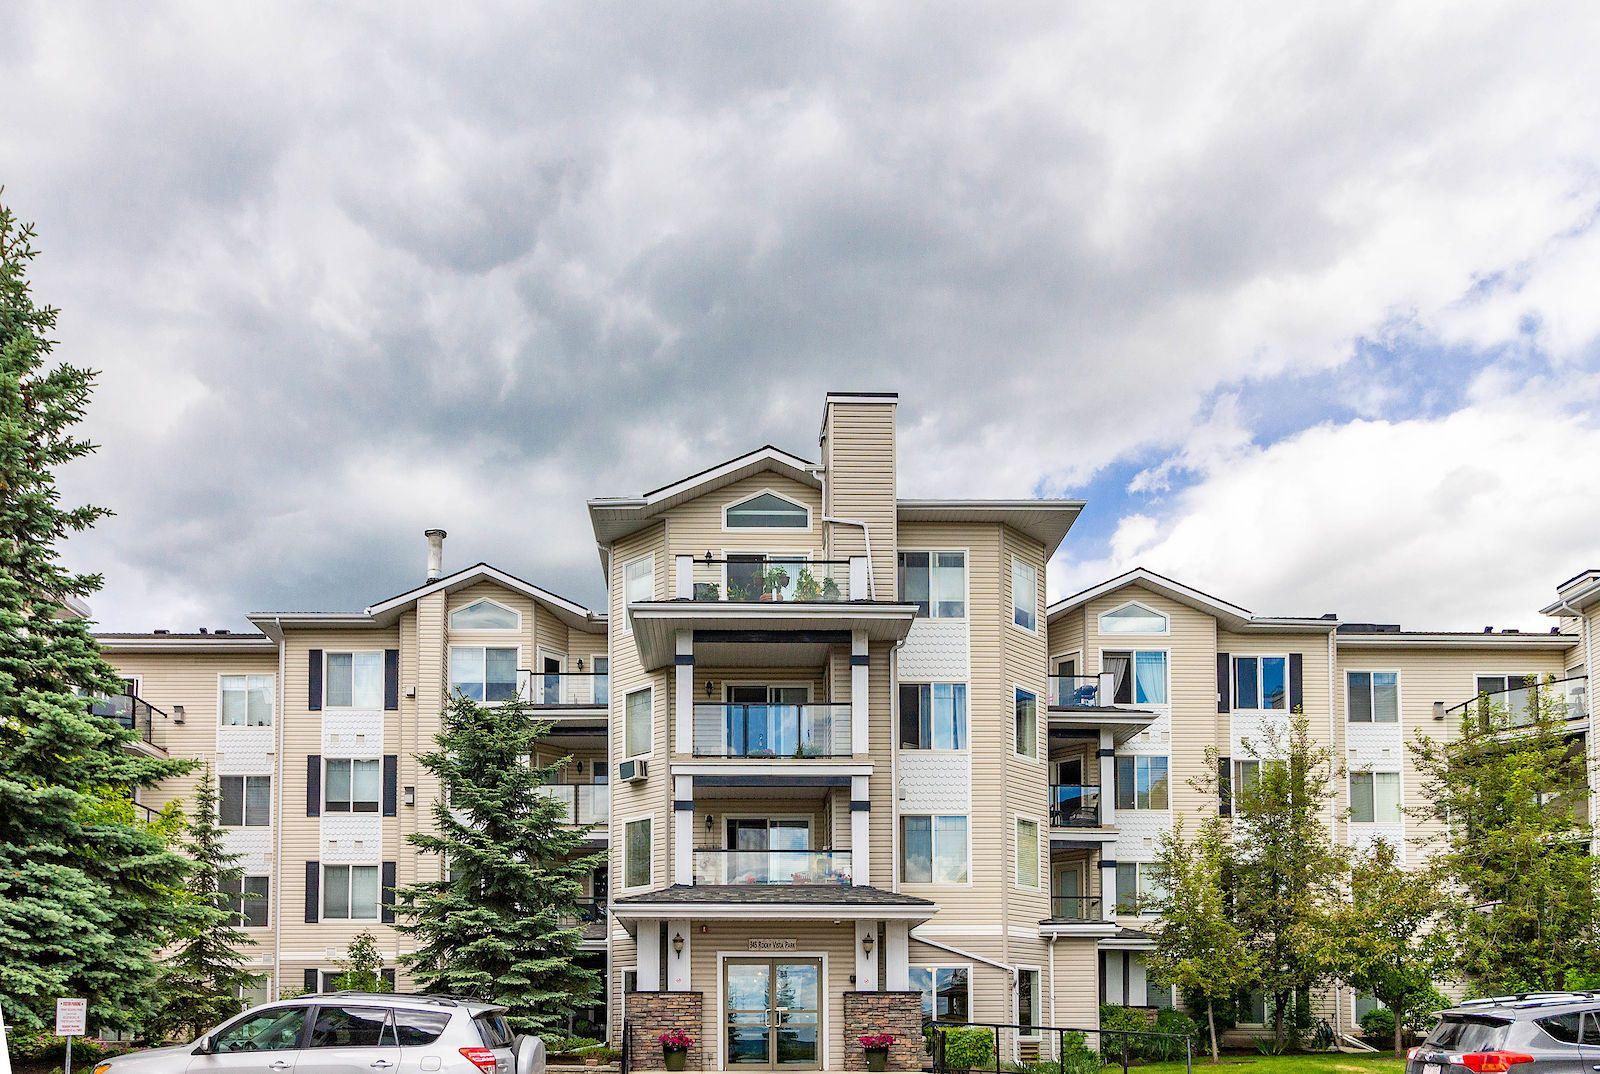 Calgary Rocky Ridge Condo For Rent Welcome To 345 Rocky Vista Park Nw This Incredible Rocky Ridge 2 Bedroom 2 Bath Has An Op Condos For Rent Condo Cozy Living